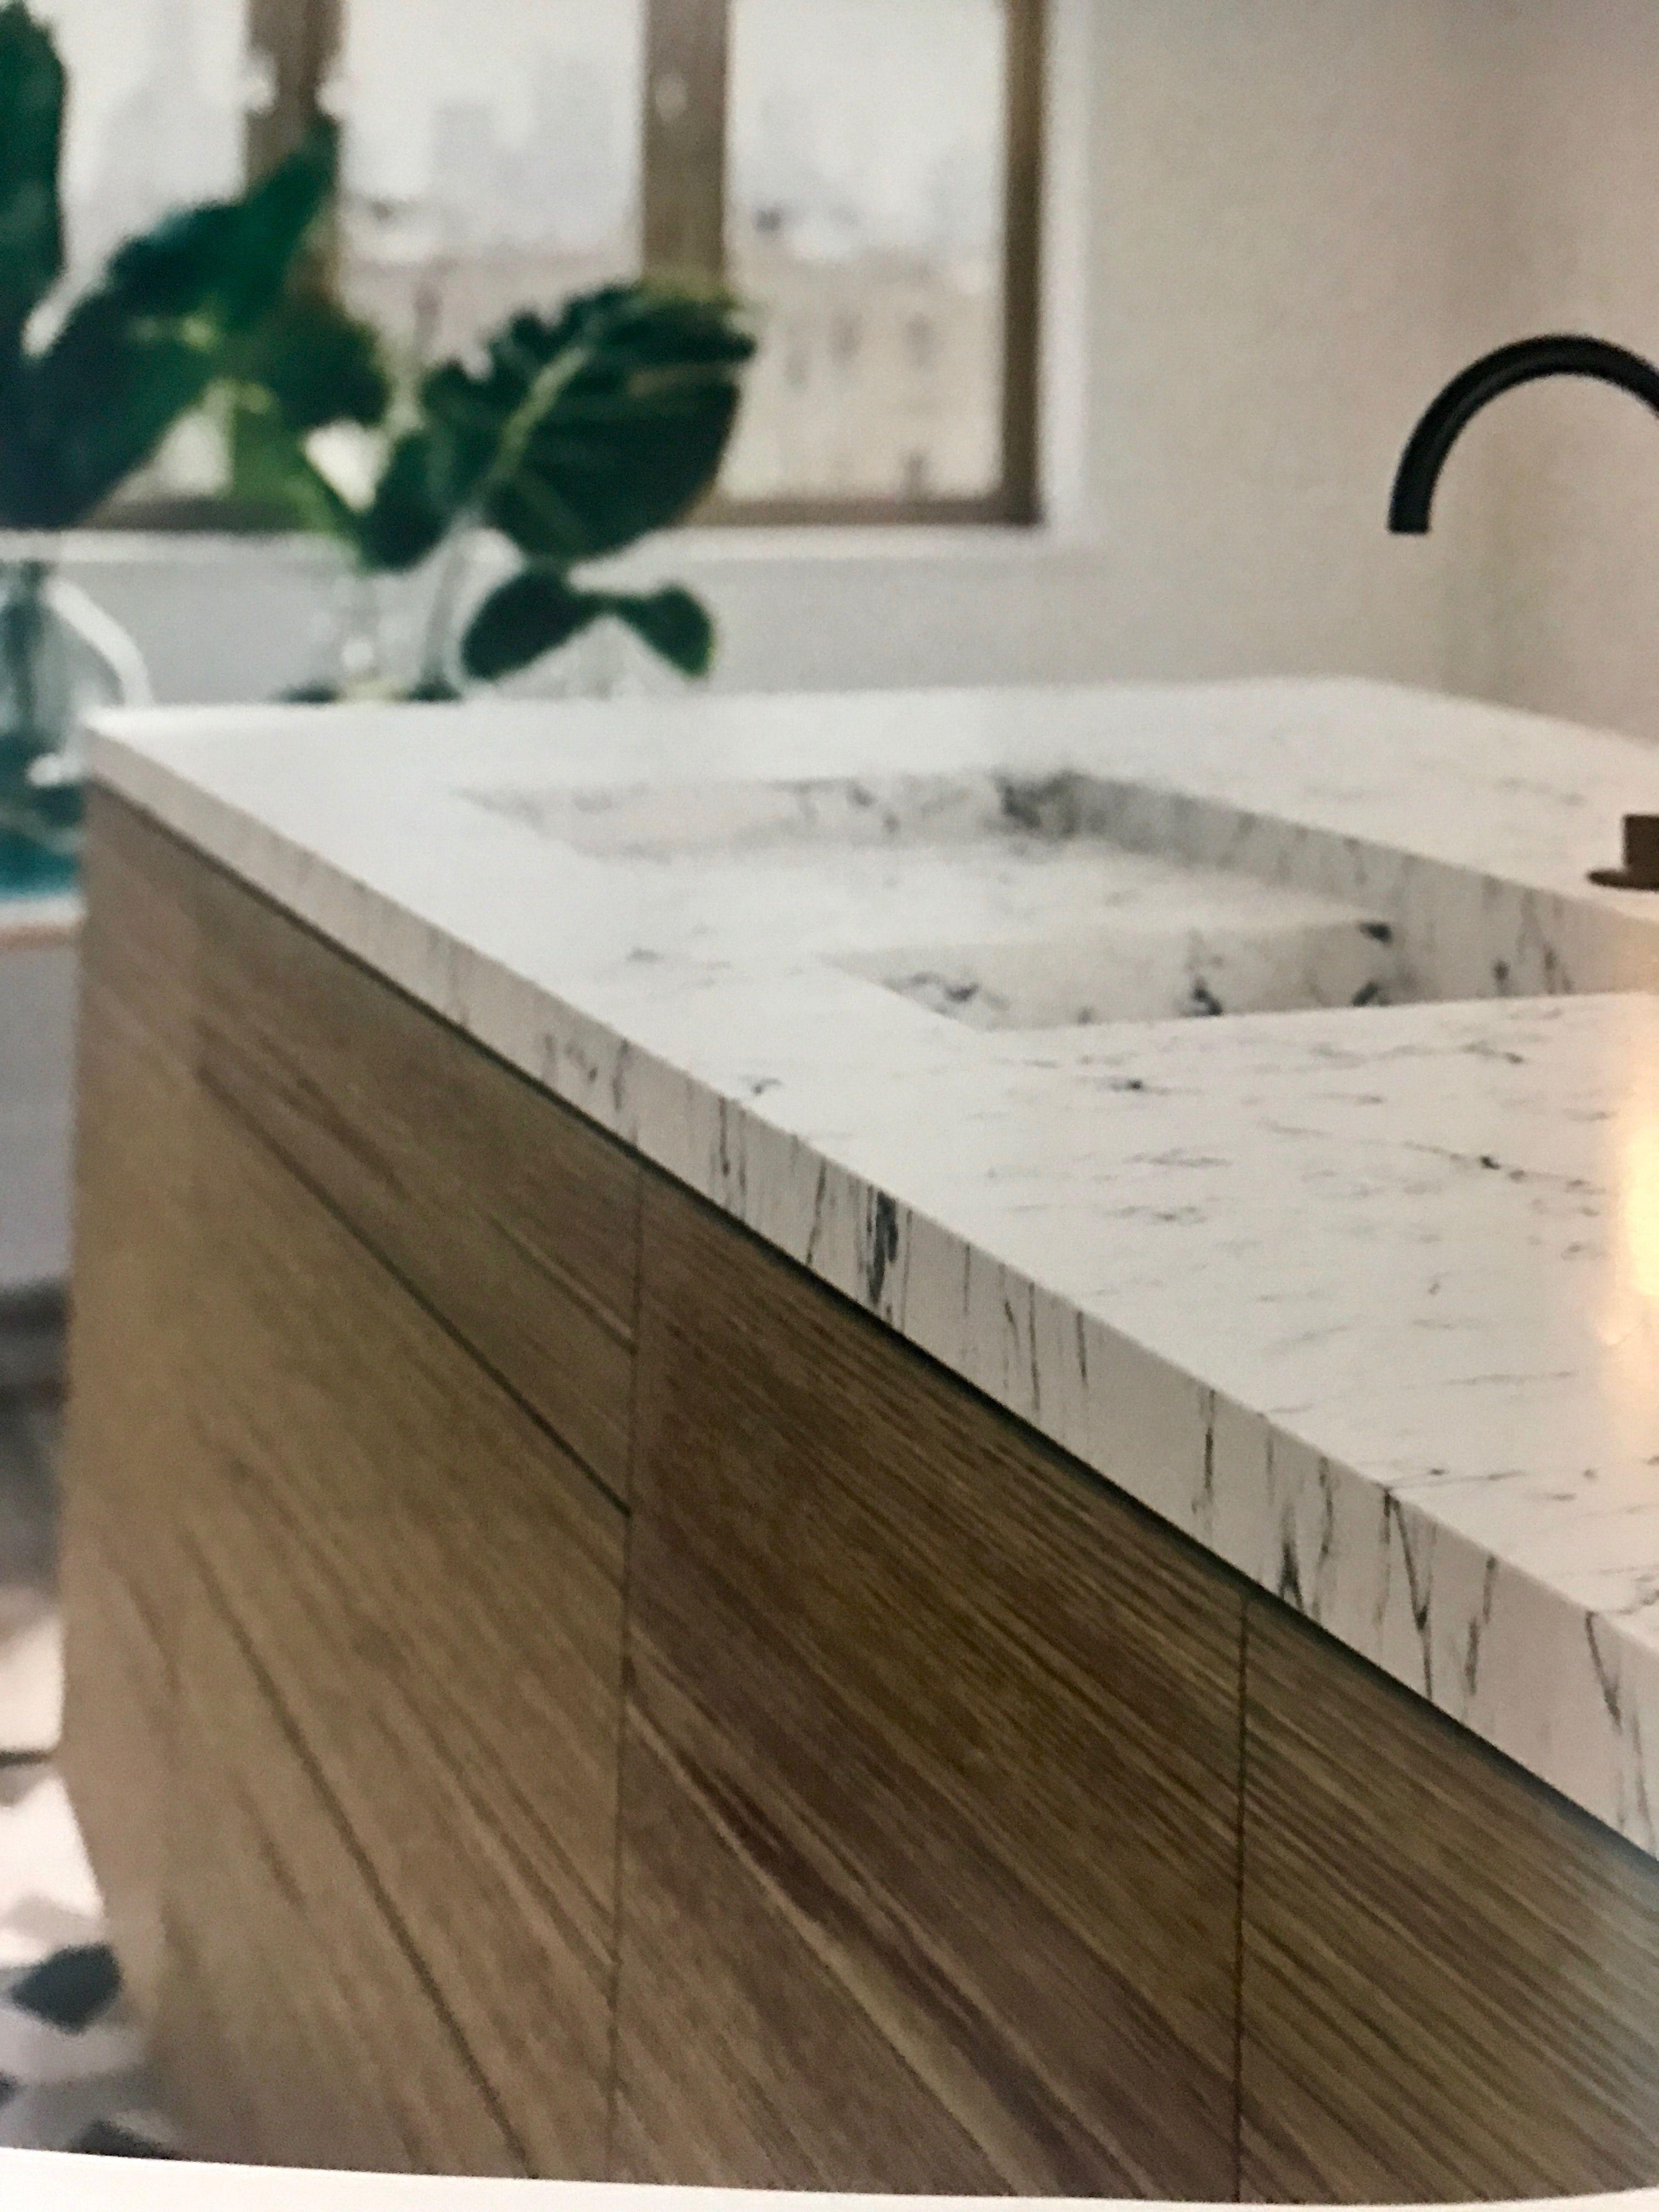 Ceaserstone Marble Bathroom Counter Counter Design Marble Bathroom